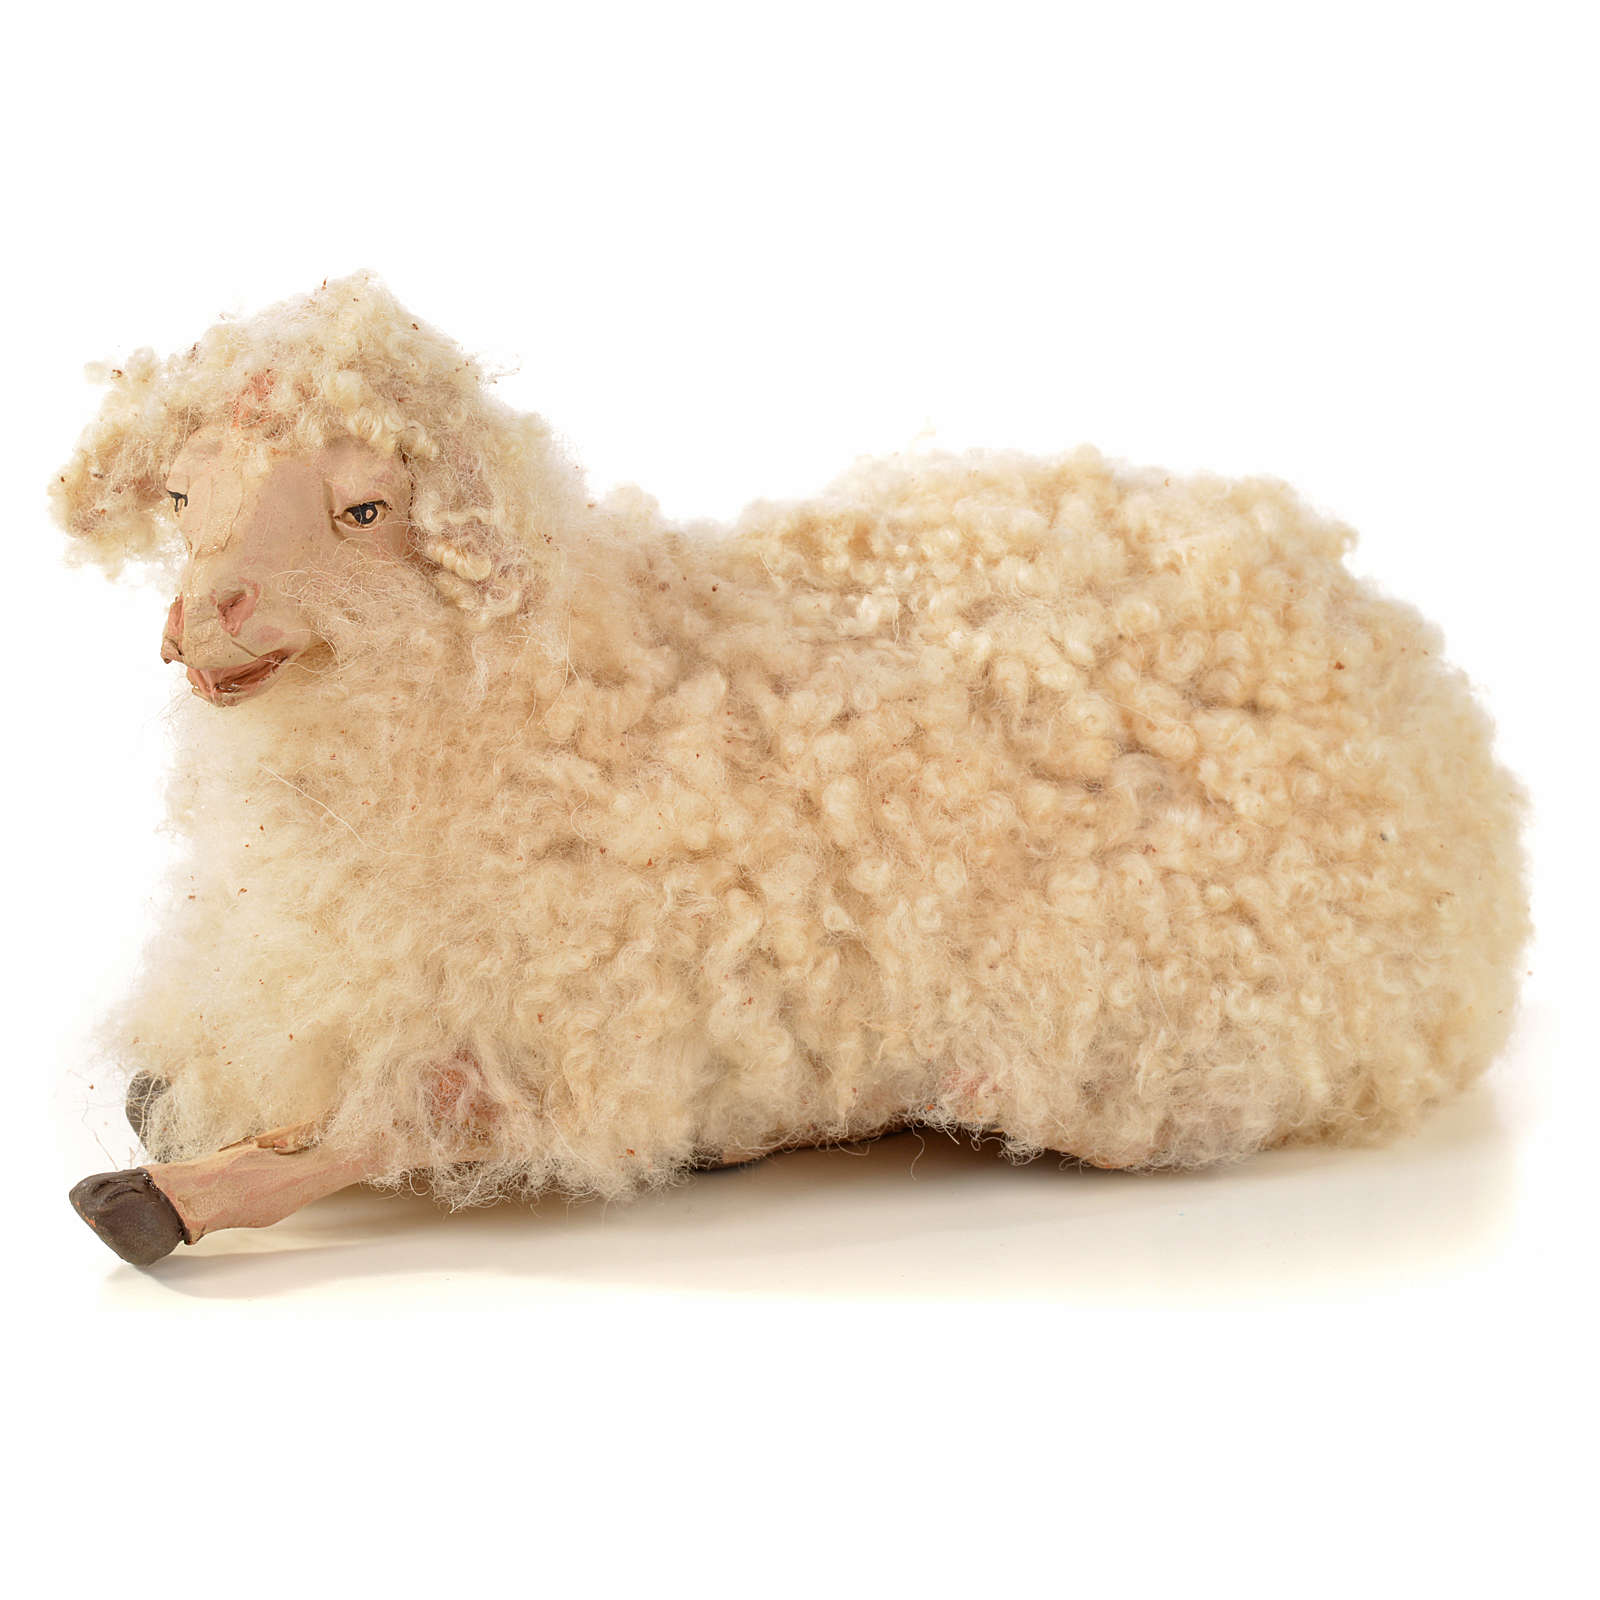 Neapolitan Nativity scene figurine, kit, 3 sheep with wool 4